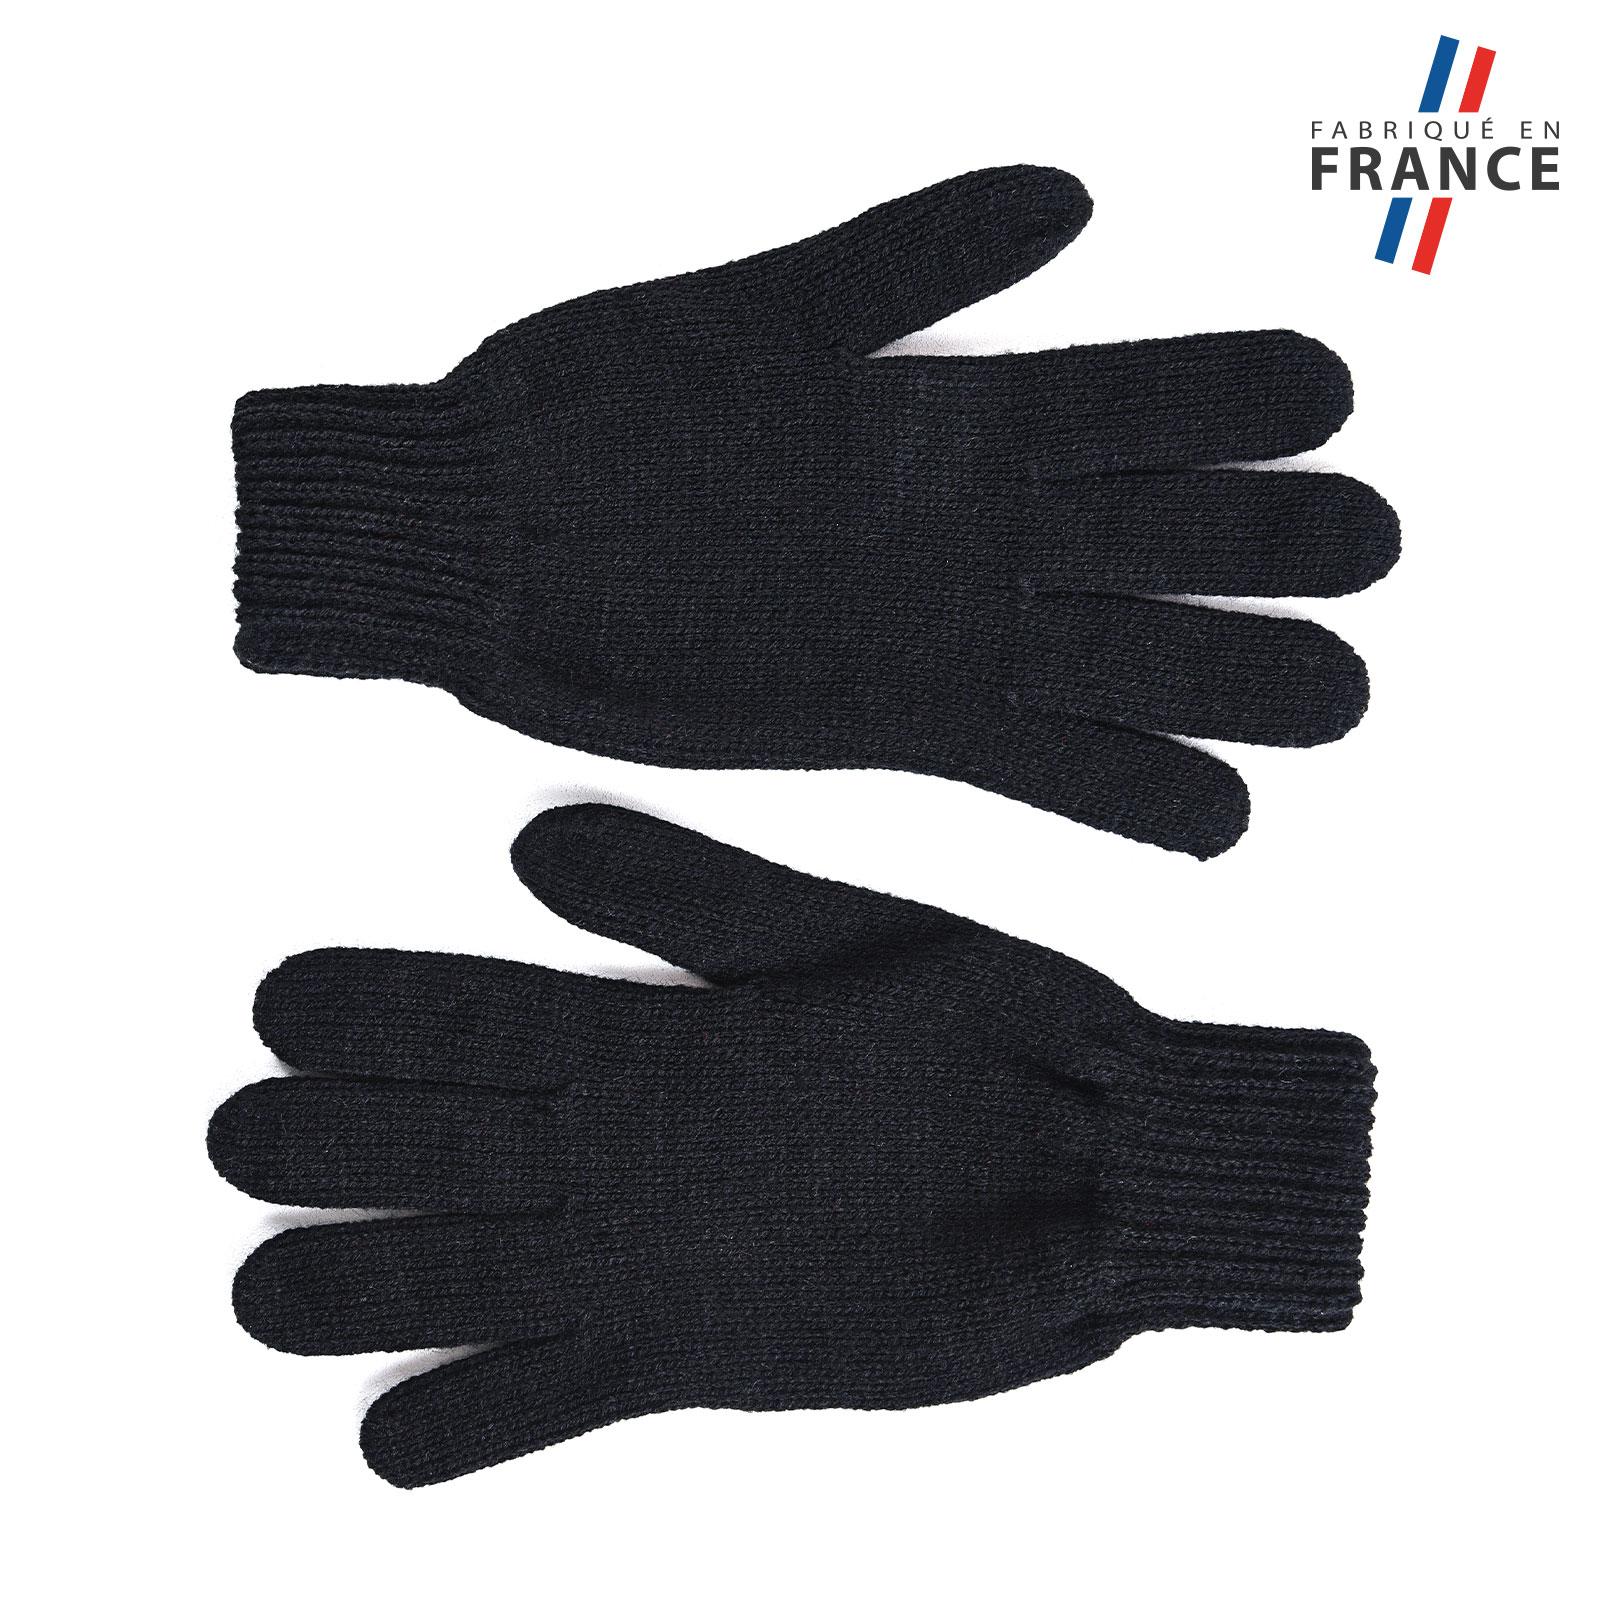 GA-00003-A16-LB_FR-gants-femme-fabriques-en-france-noirs